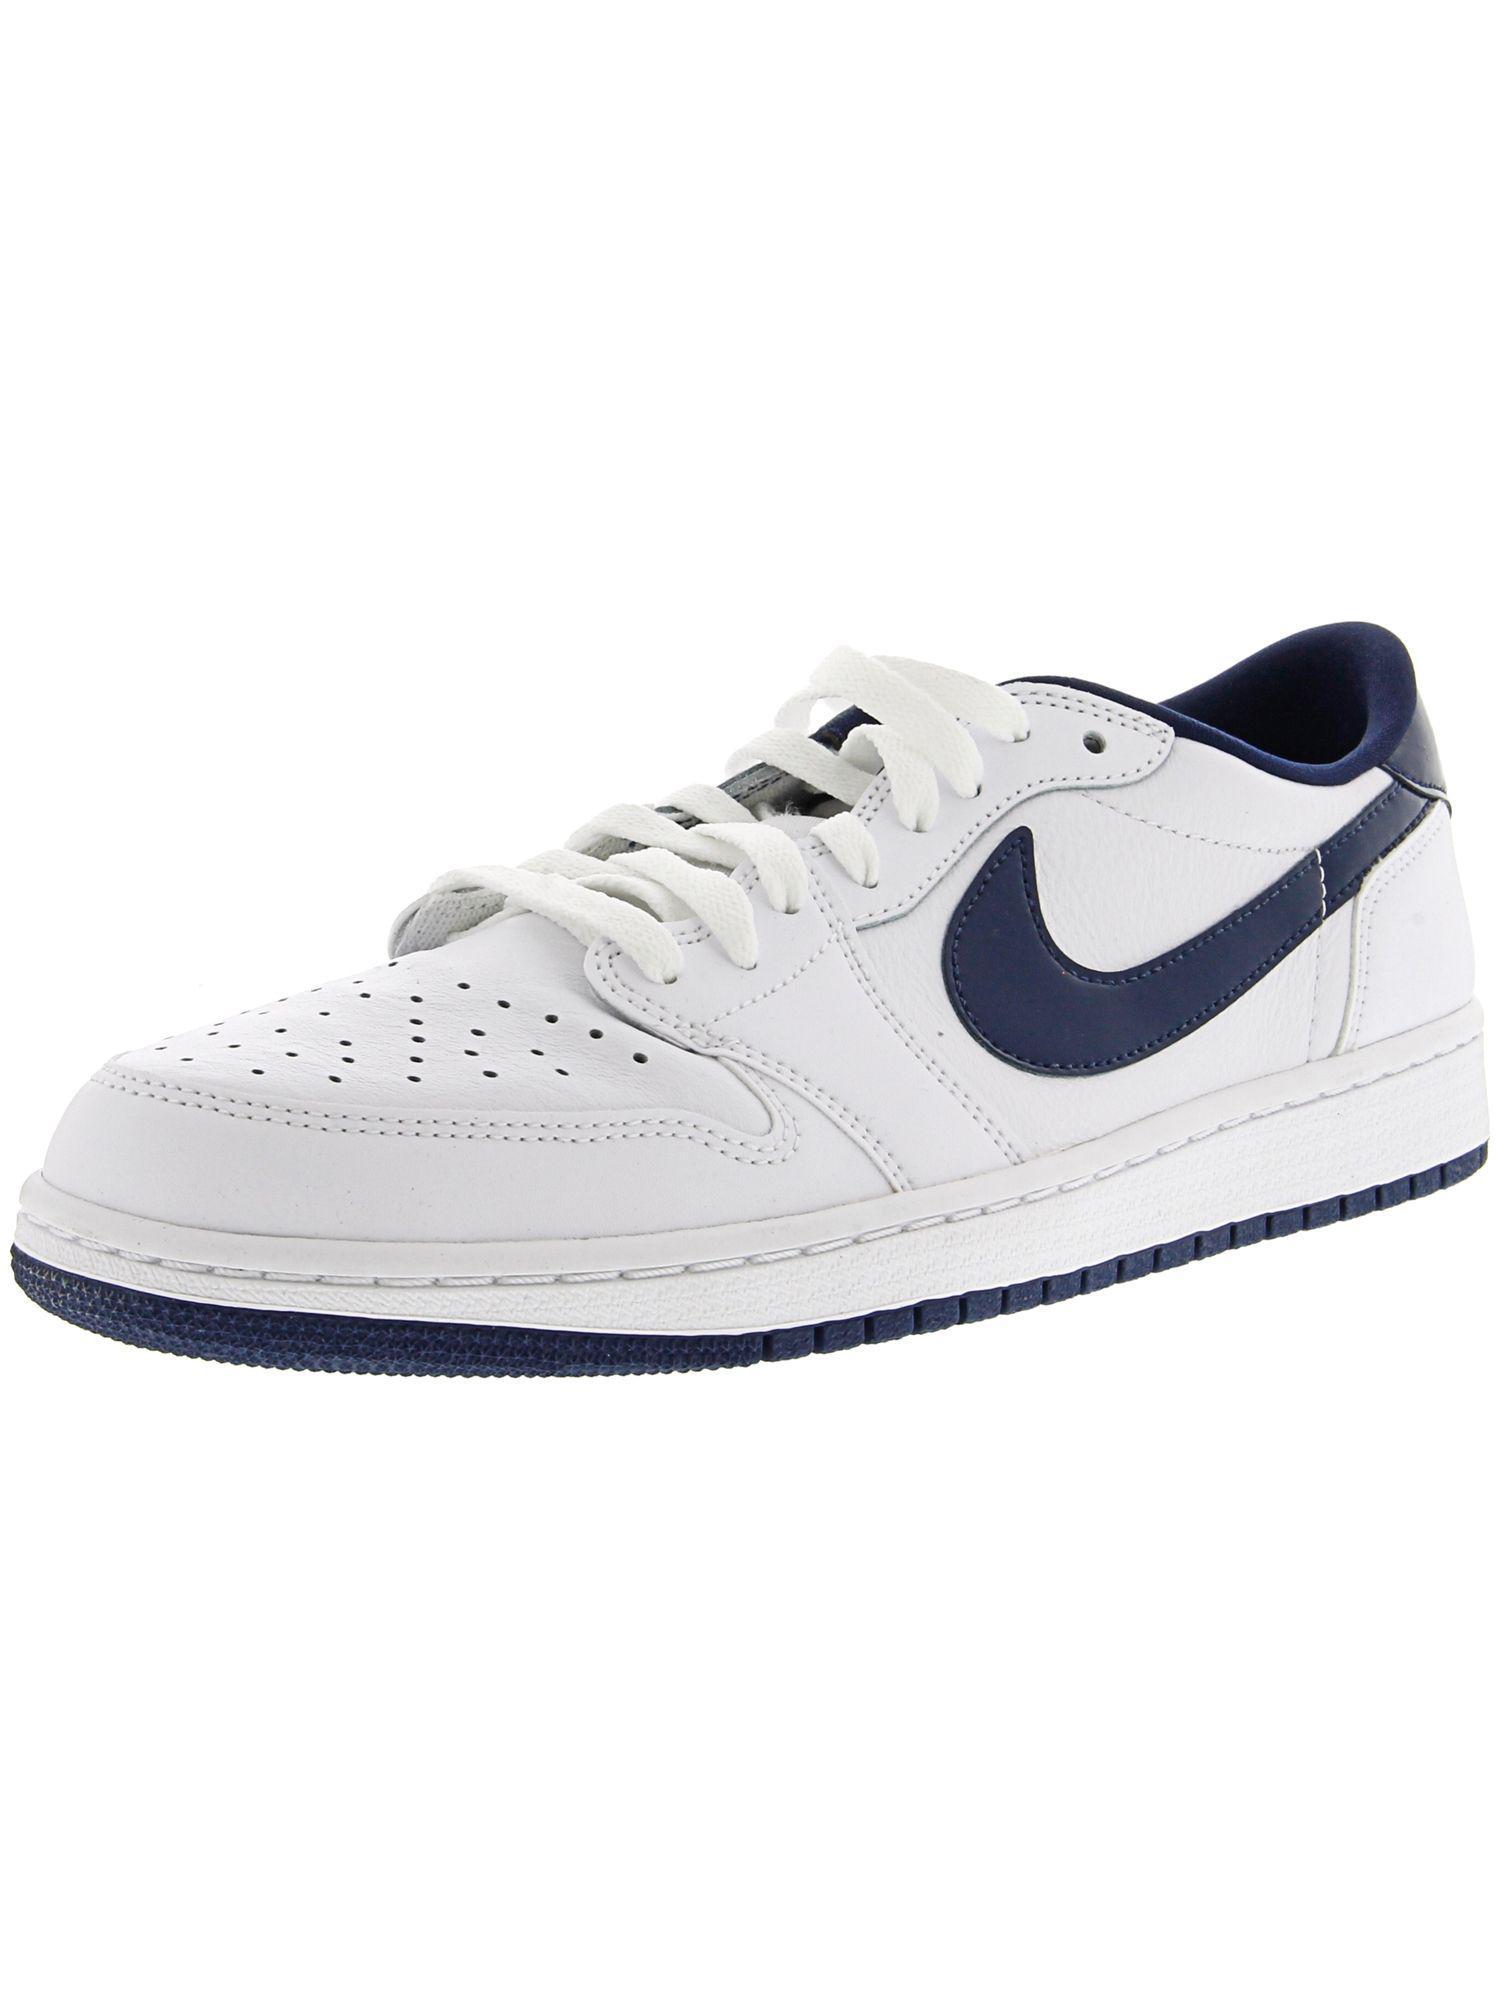 65c913af18b Nike. White Men s Air Jordan 1 Retro Low Og Ankle-high Fashion Sneaker